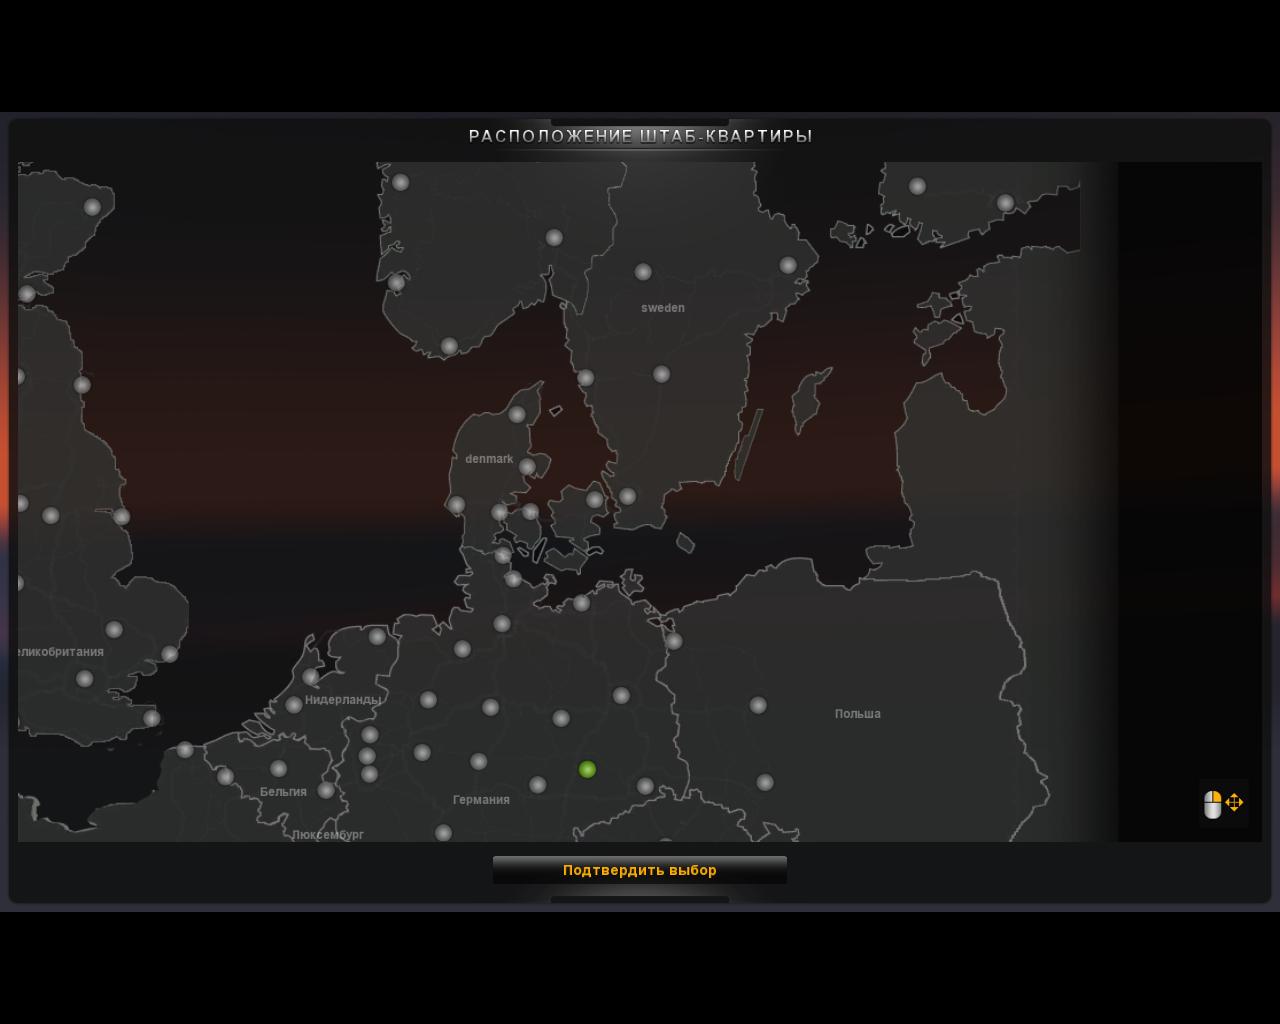 Promods Скандинавия v 1.0.1 1_(3)